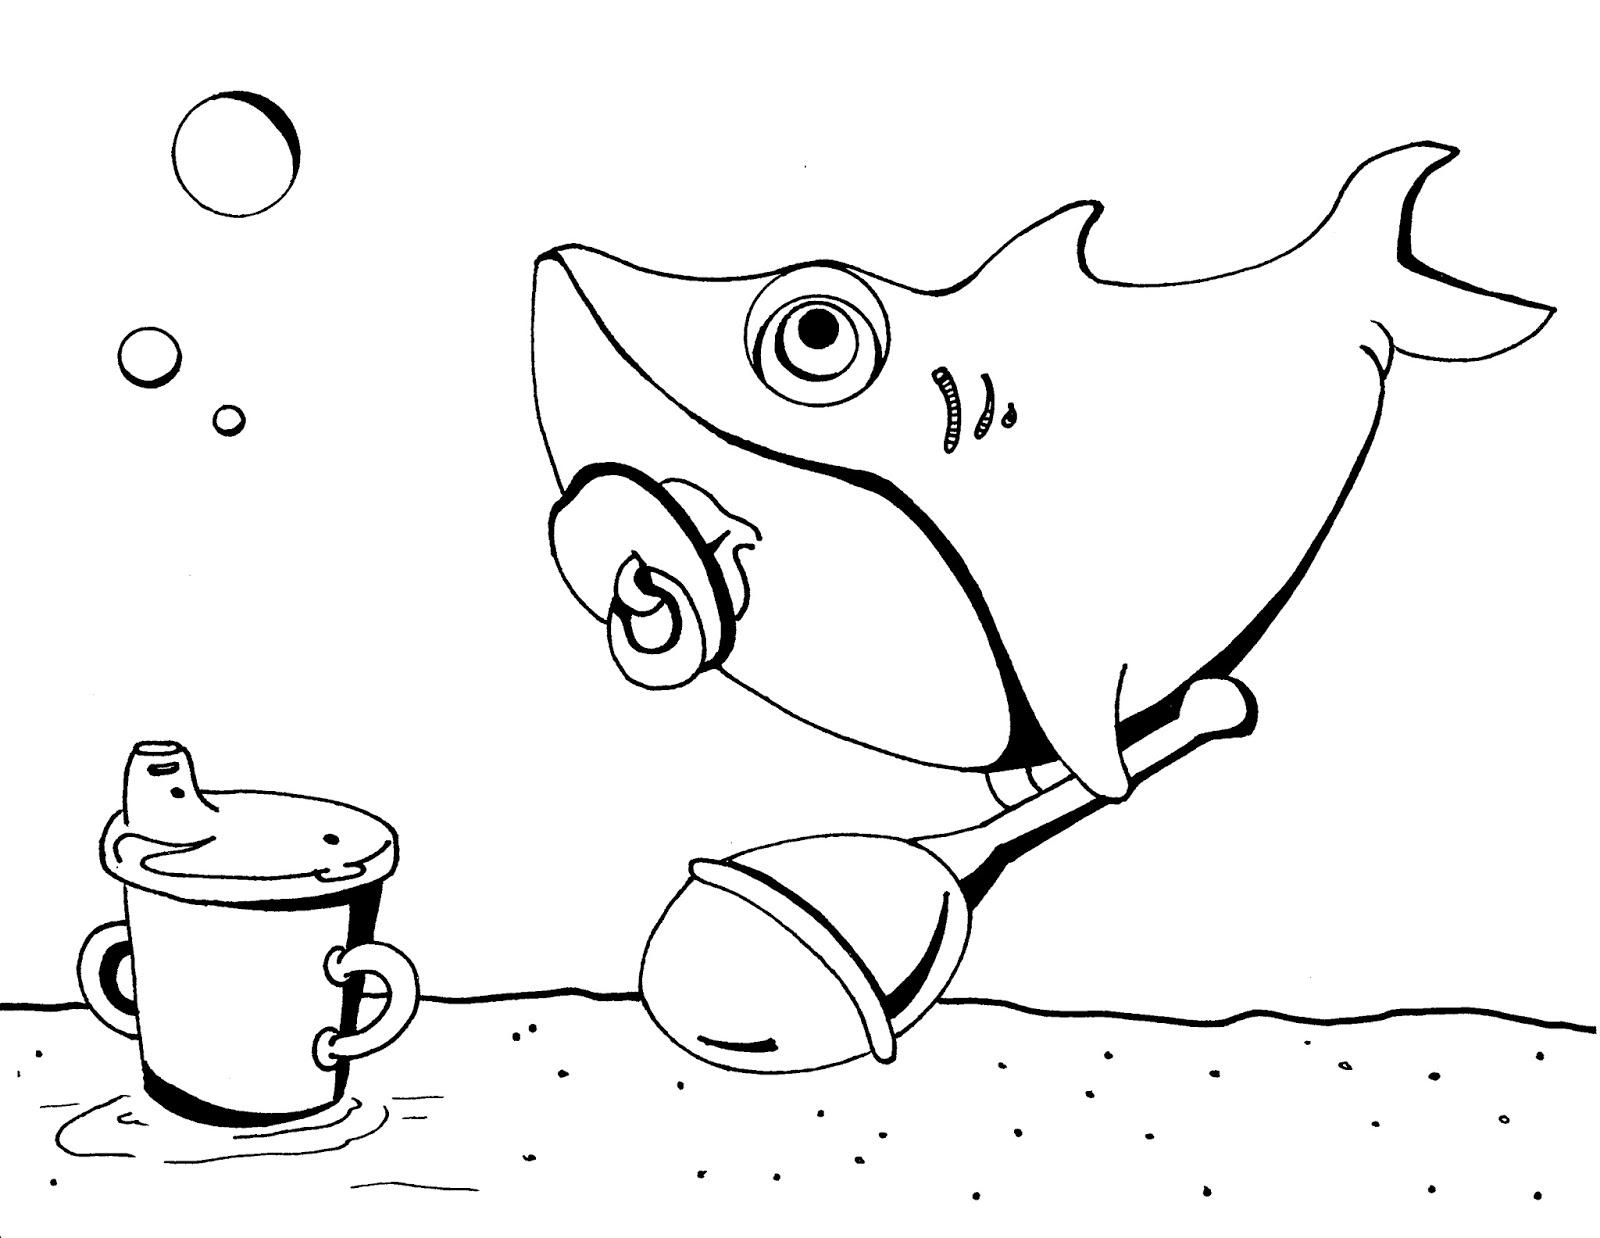 FAME: Baby Shark